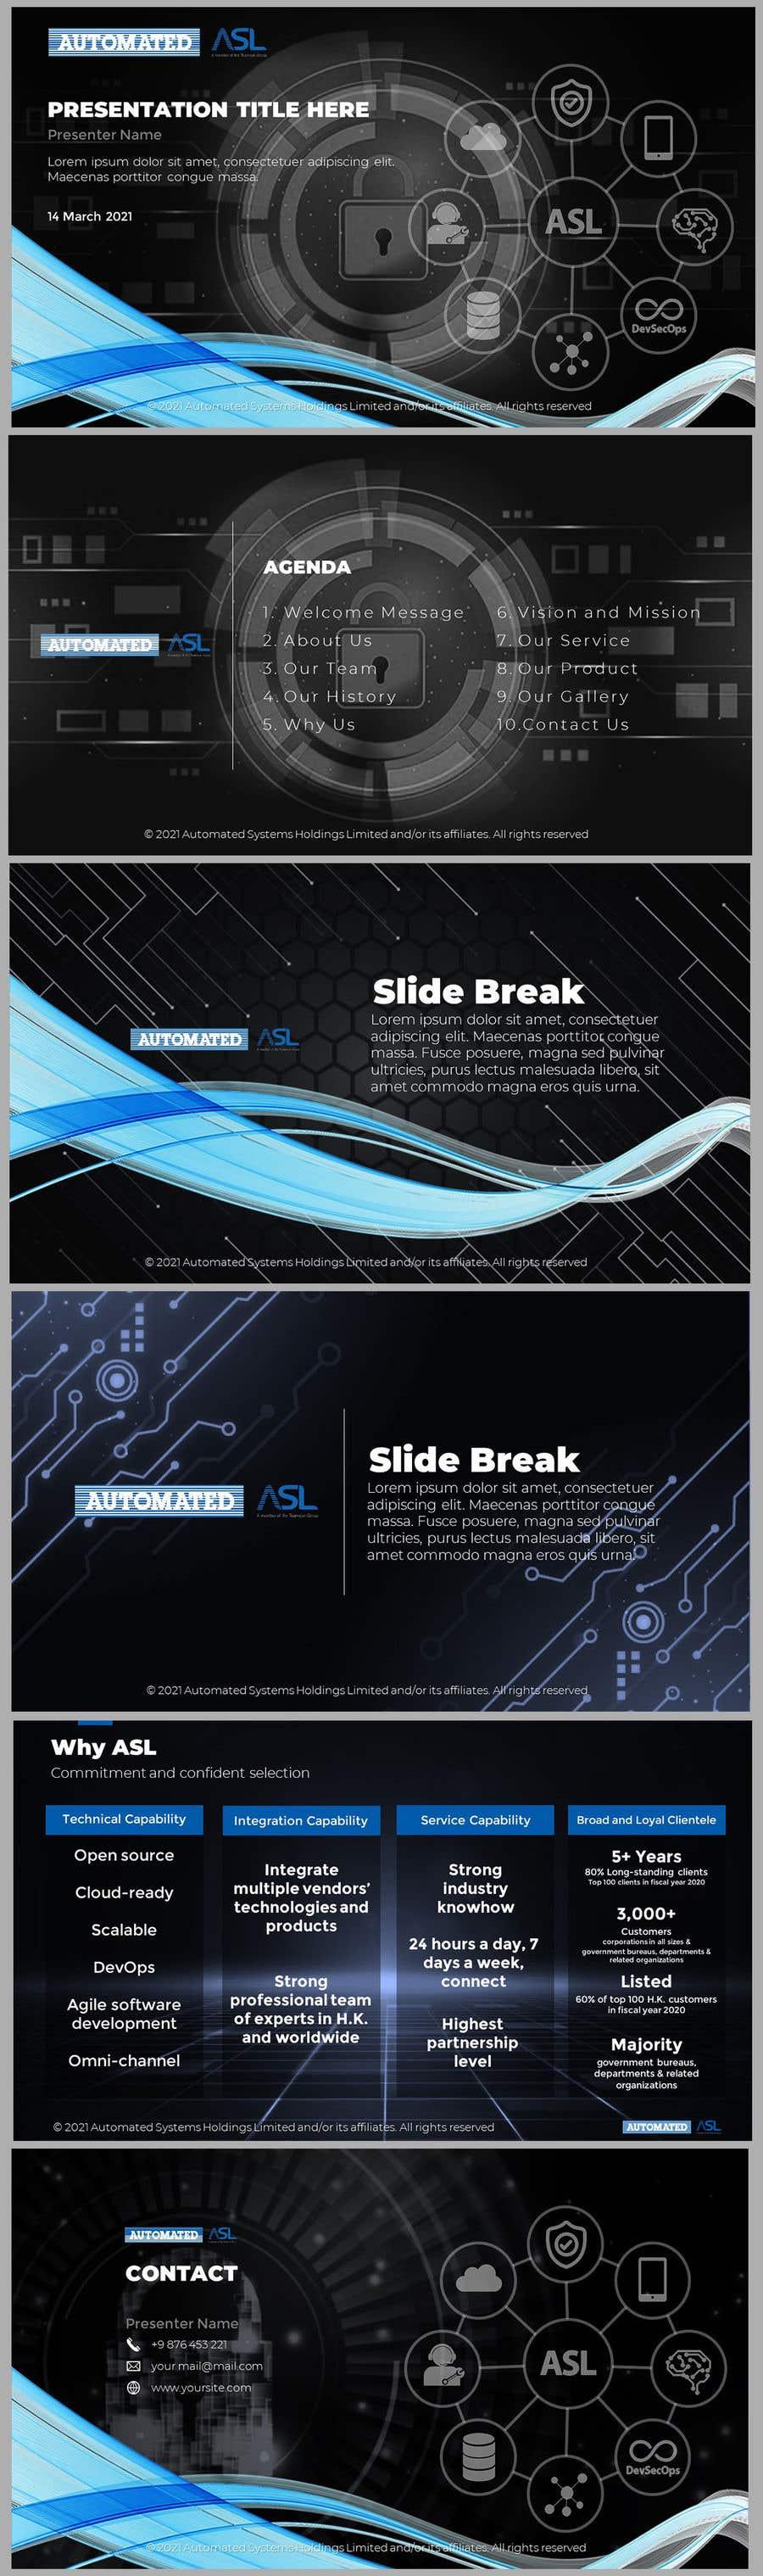 Bài tham dự cuộc thi #                                        44                                      cho                                         Corporate PPT Template Design (6 slides)